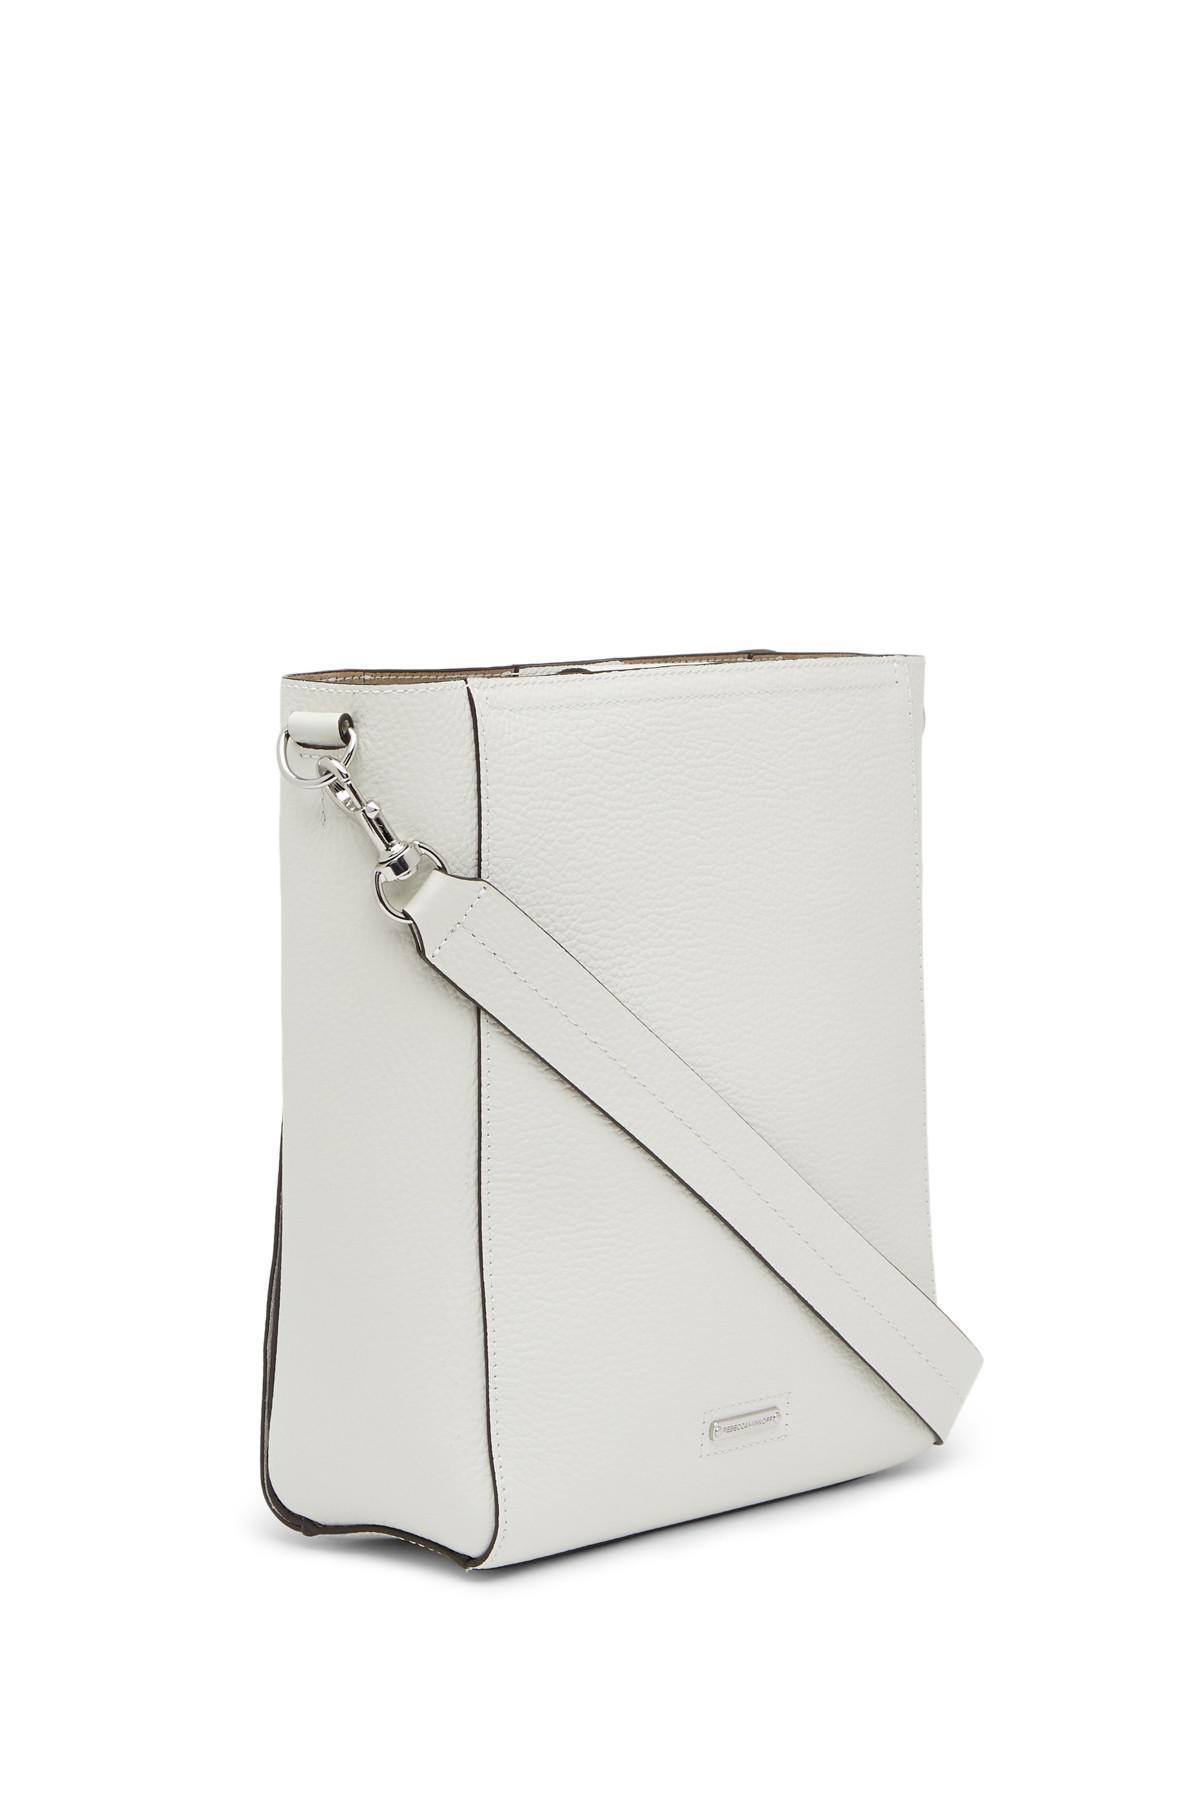 d5e30cd48f10 Rebecca Minkoff Multicolor Madison Large Leather Hobo Bag